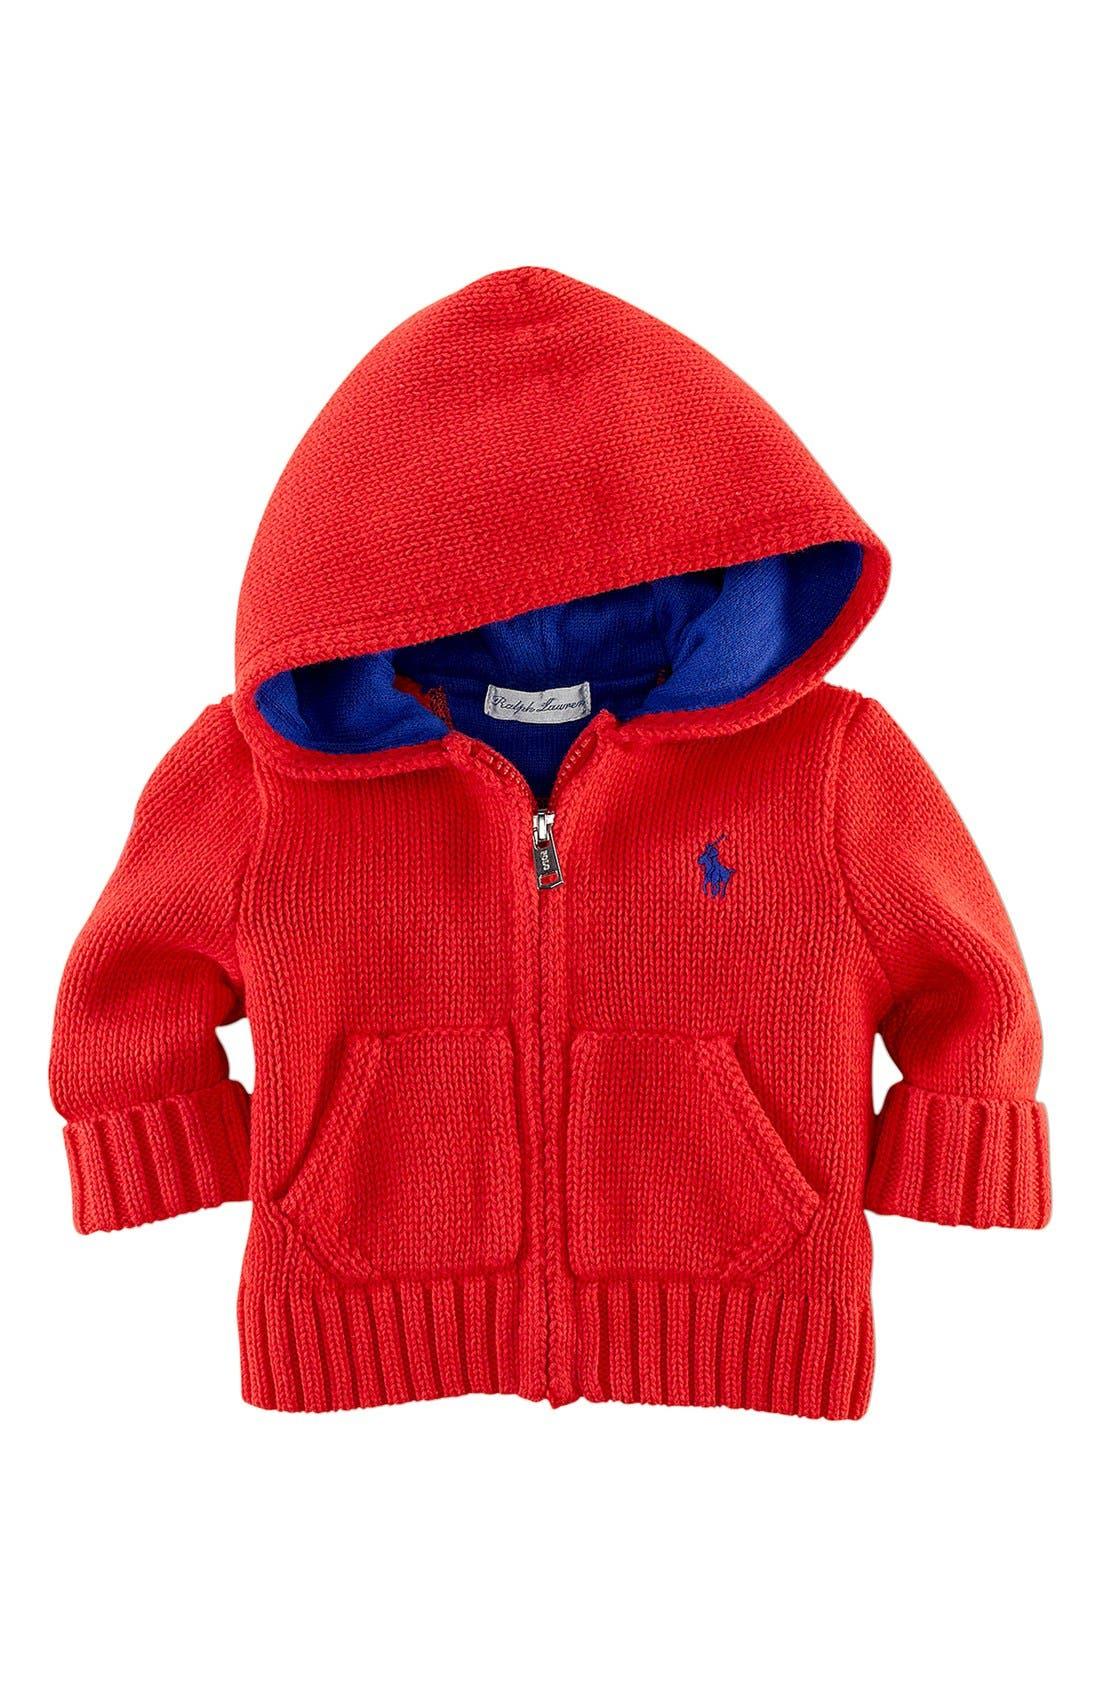 Alternate Image 1 Selected - Ralph Lauren Full Zip Hooded Cardigan (Baby)